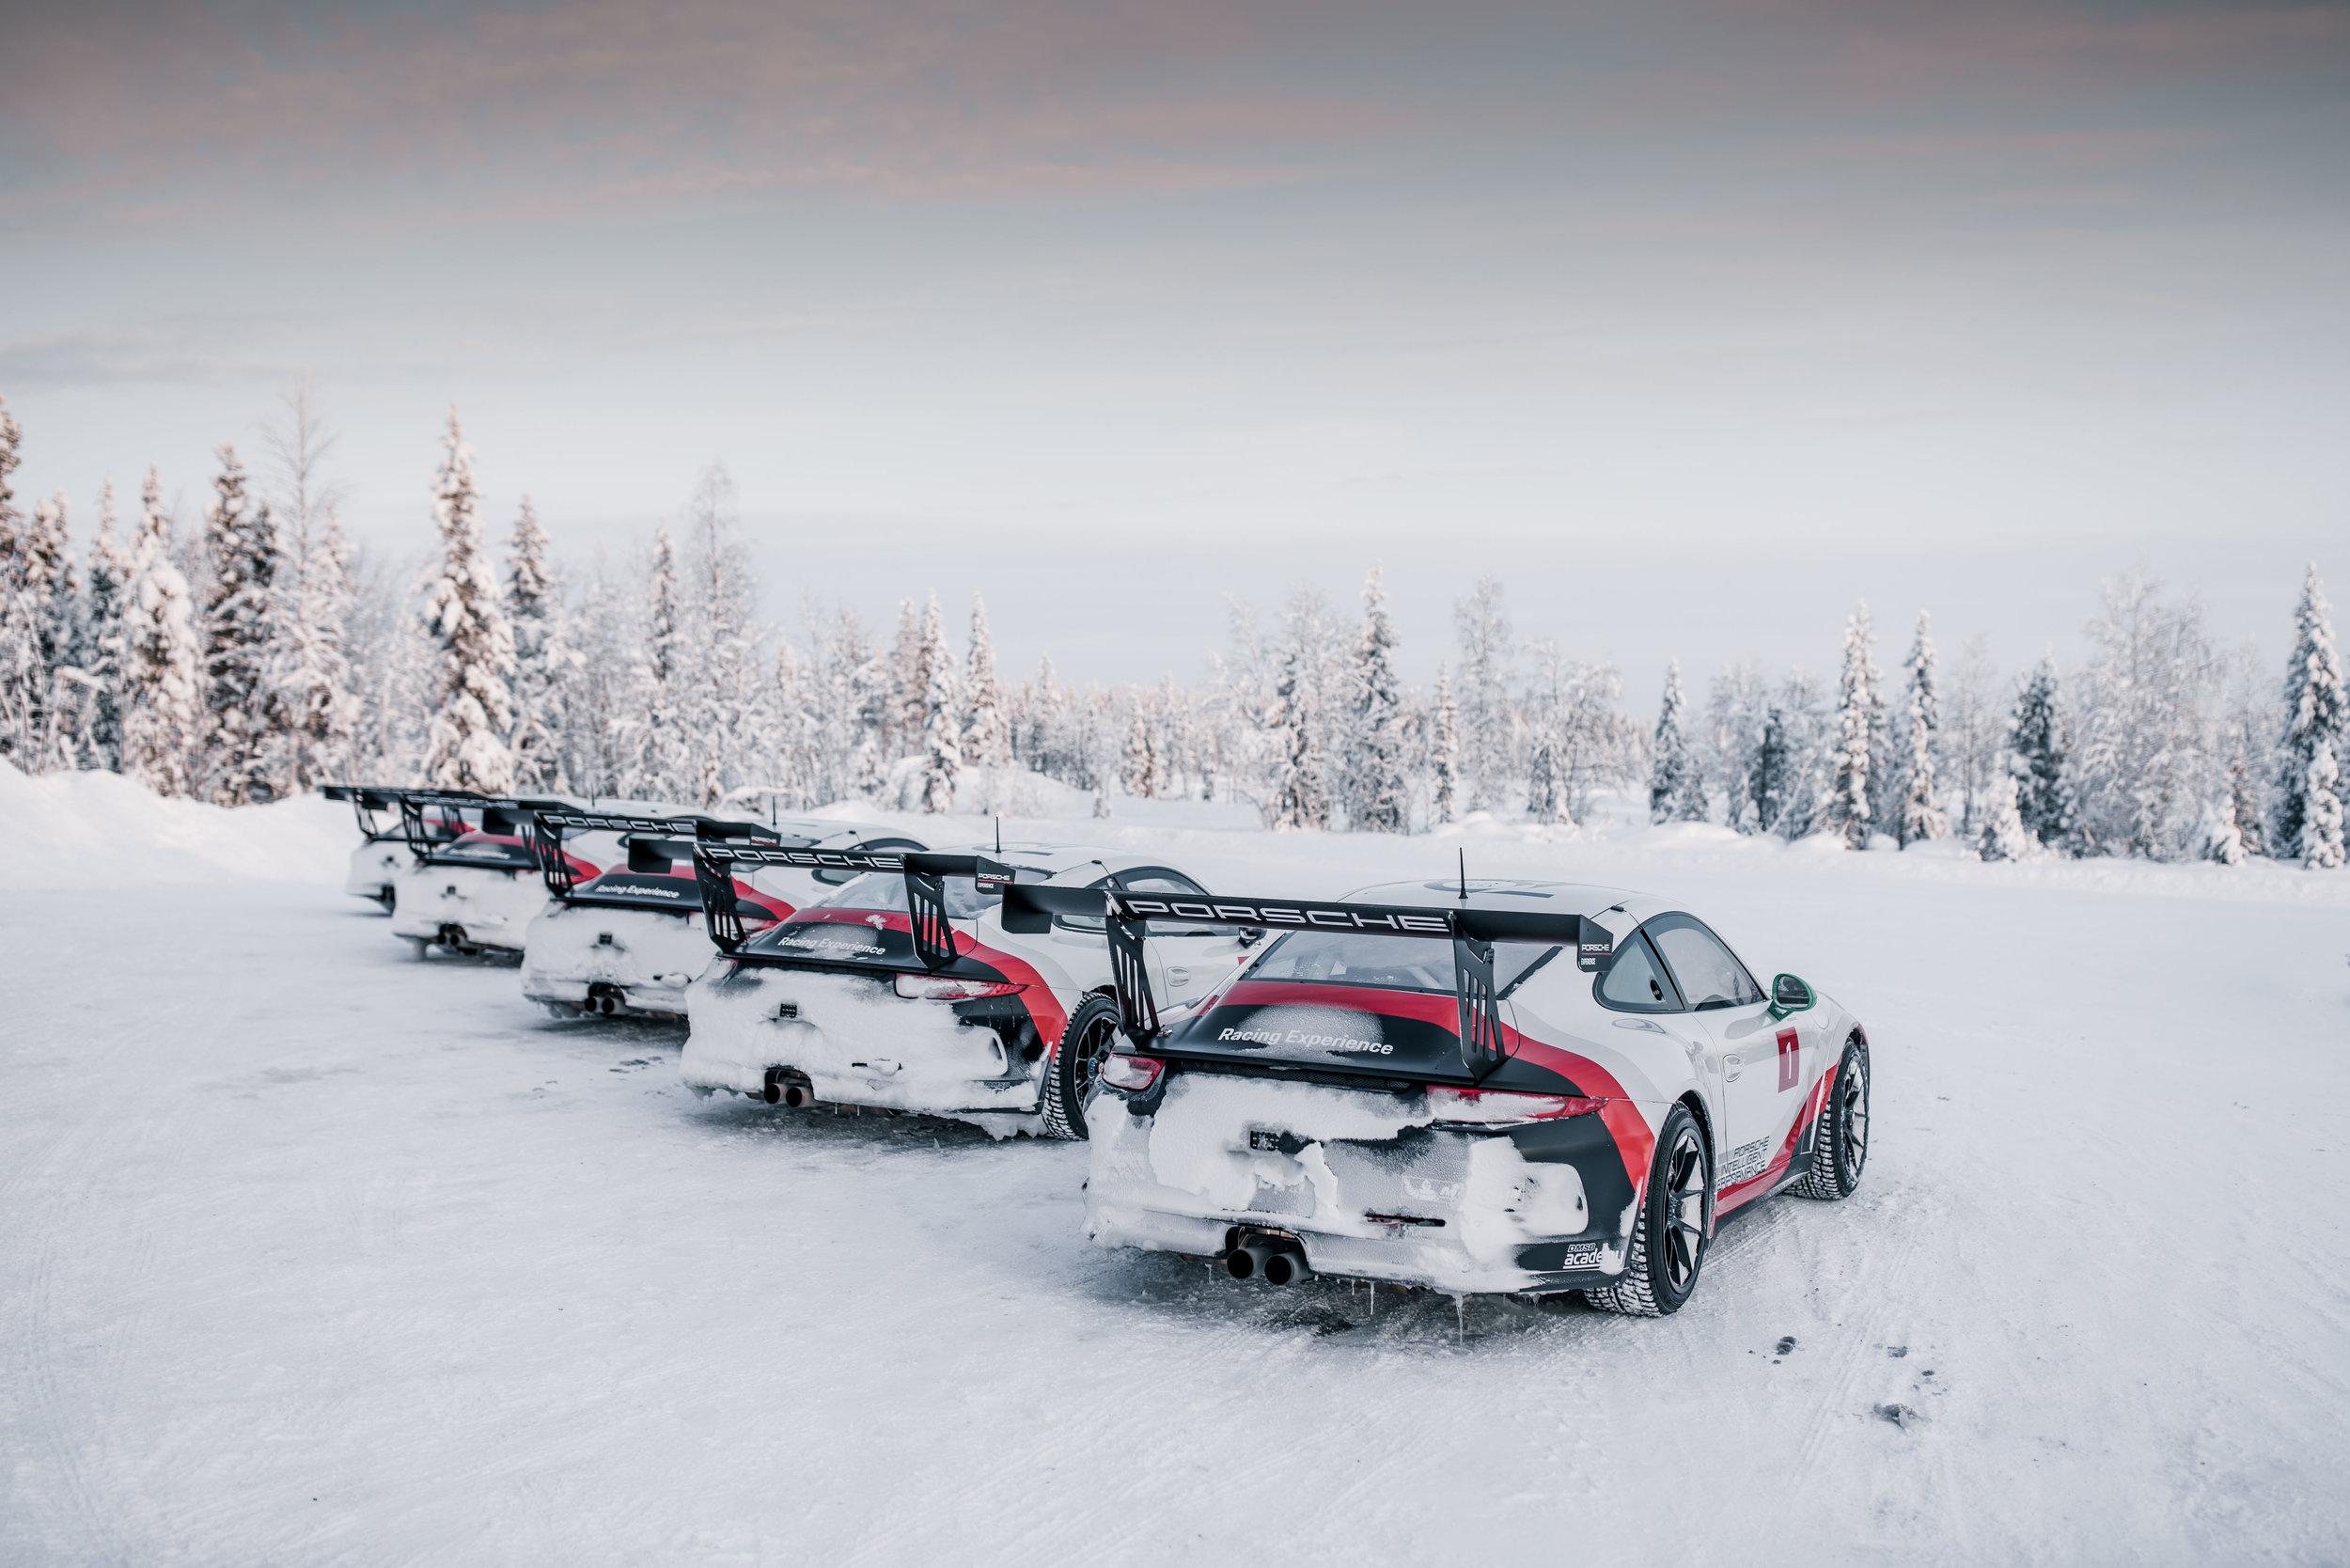 Porsche Ice Experience on Ice_30_01_2019_1532_175834.jpg